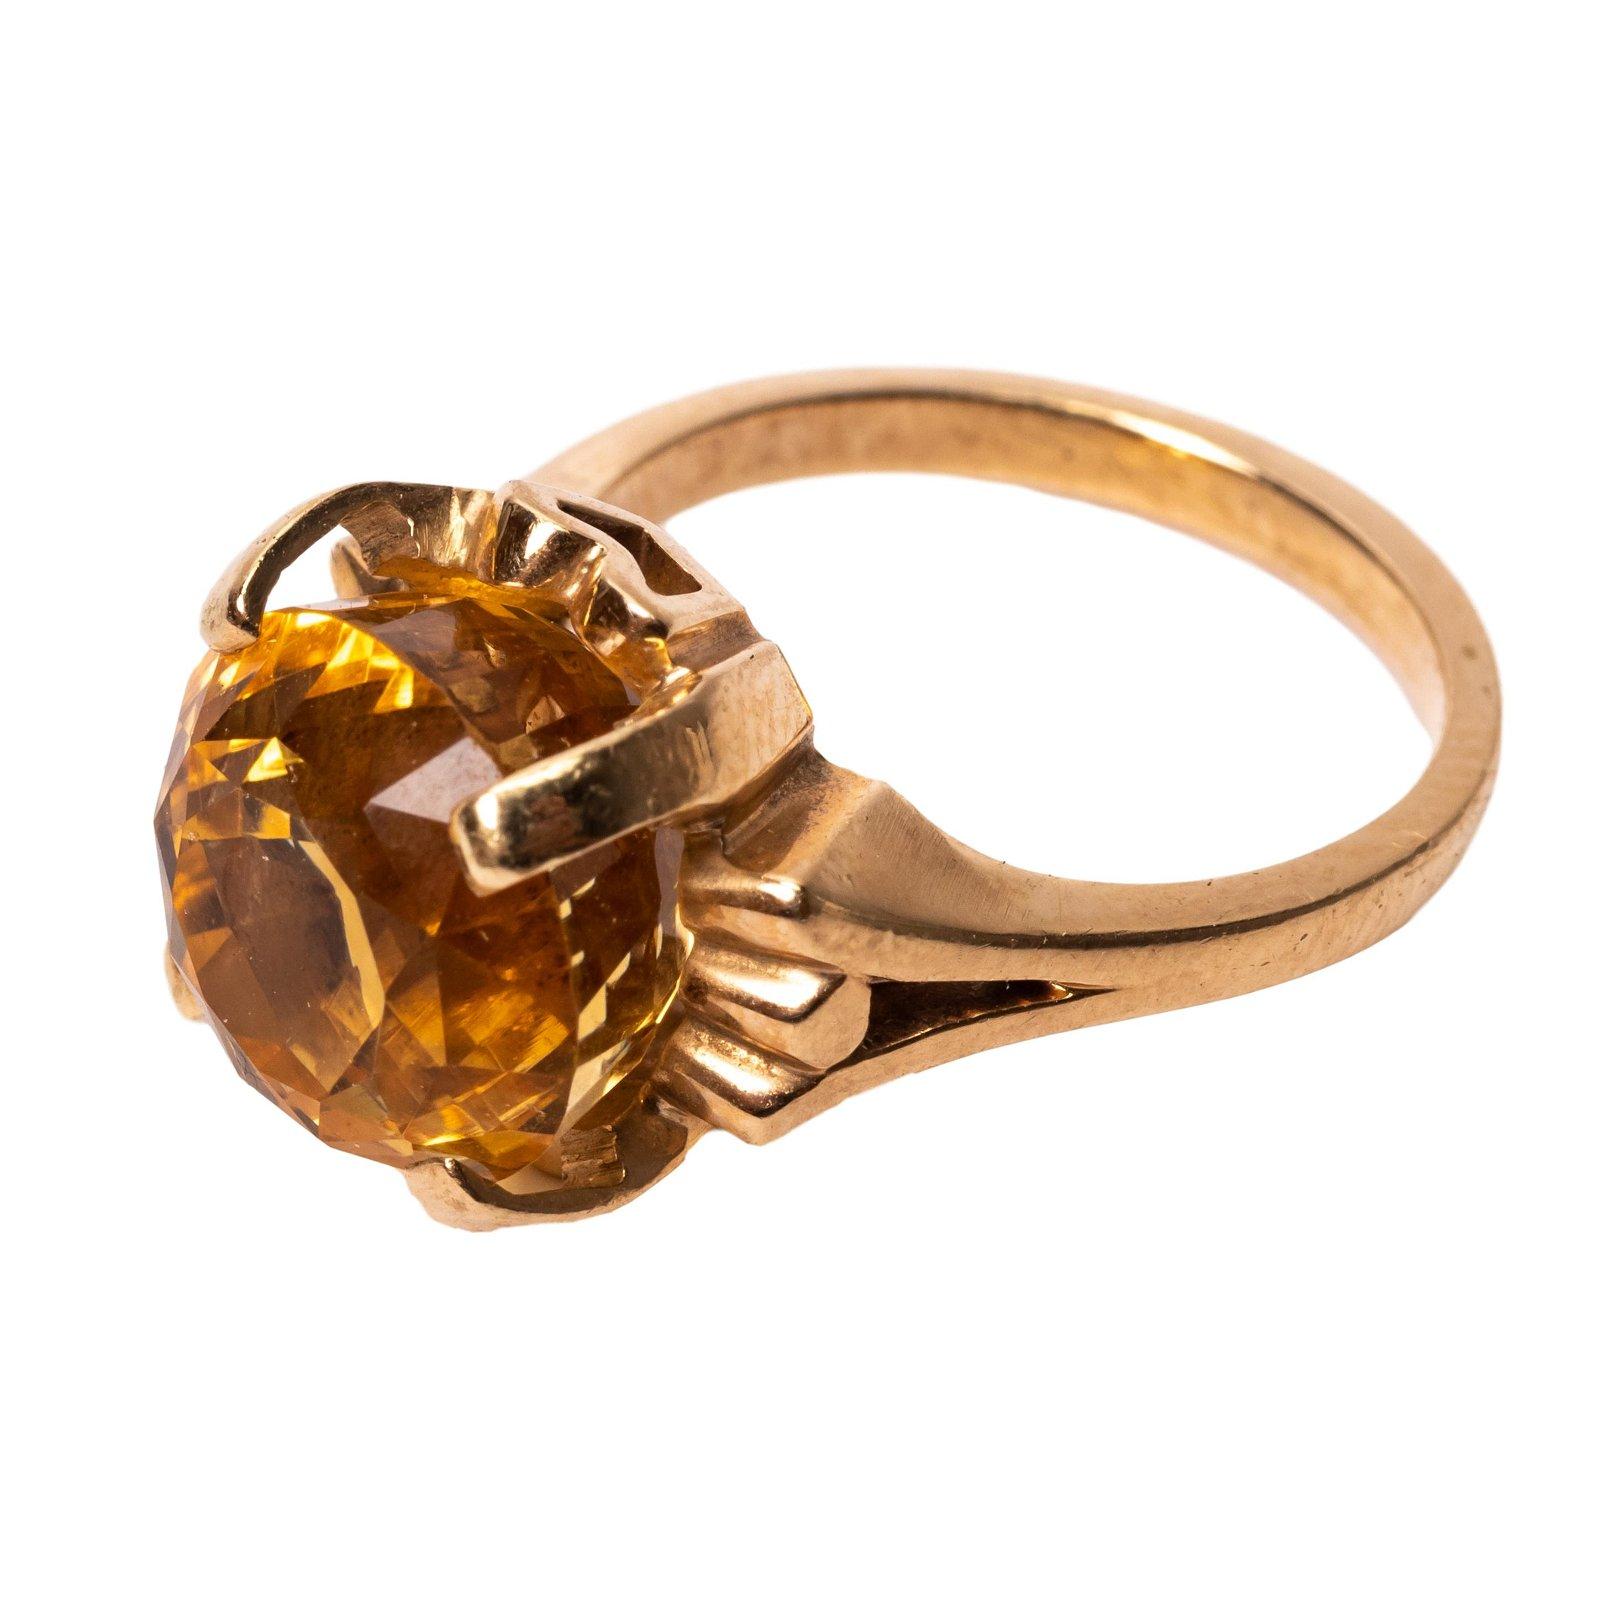 10k Gold Vintage LG 8 Carat Yellow Sapphire Ring